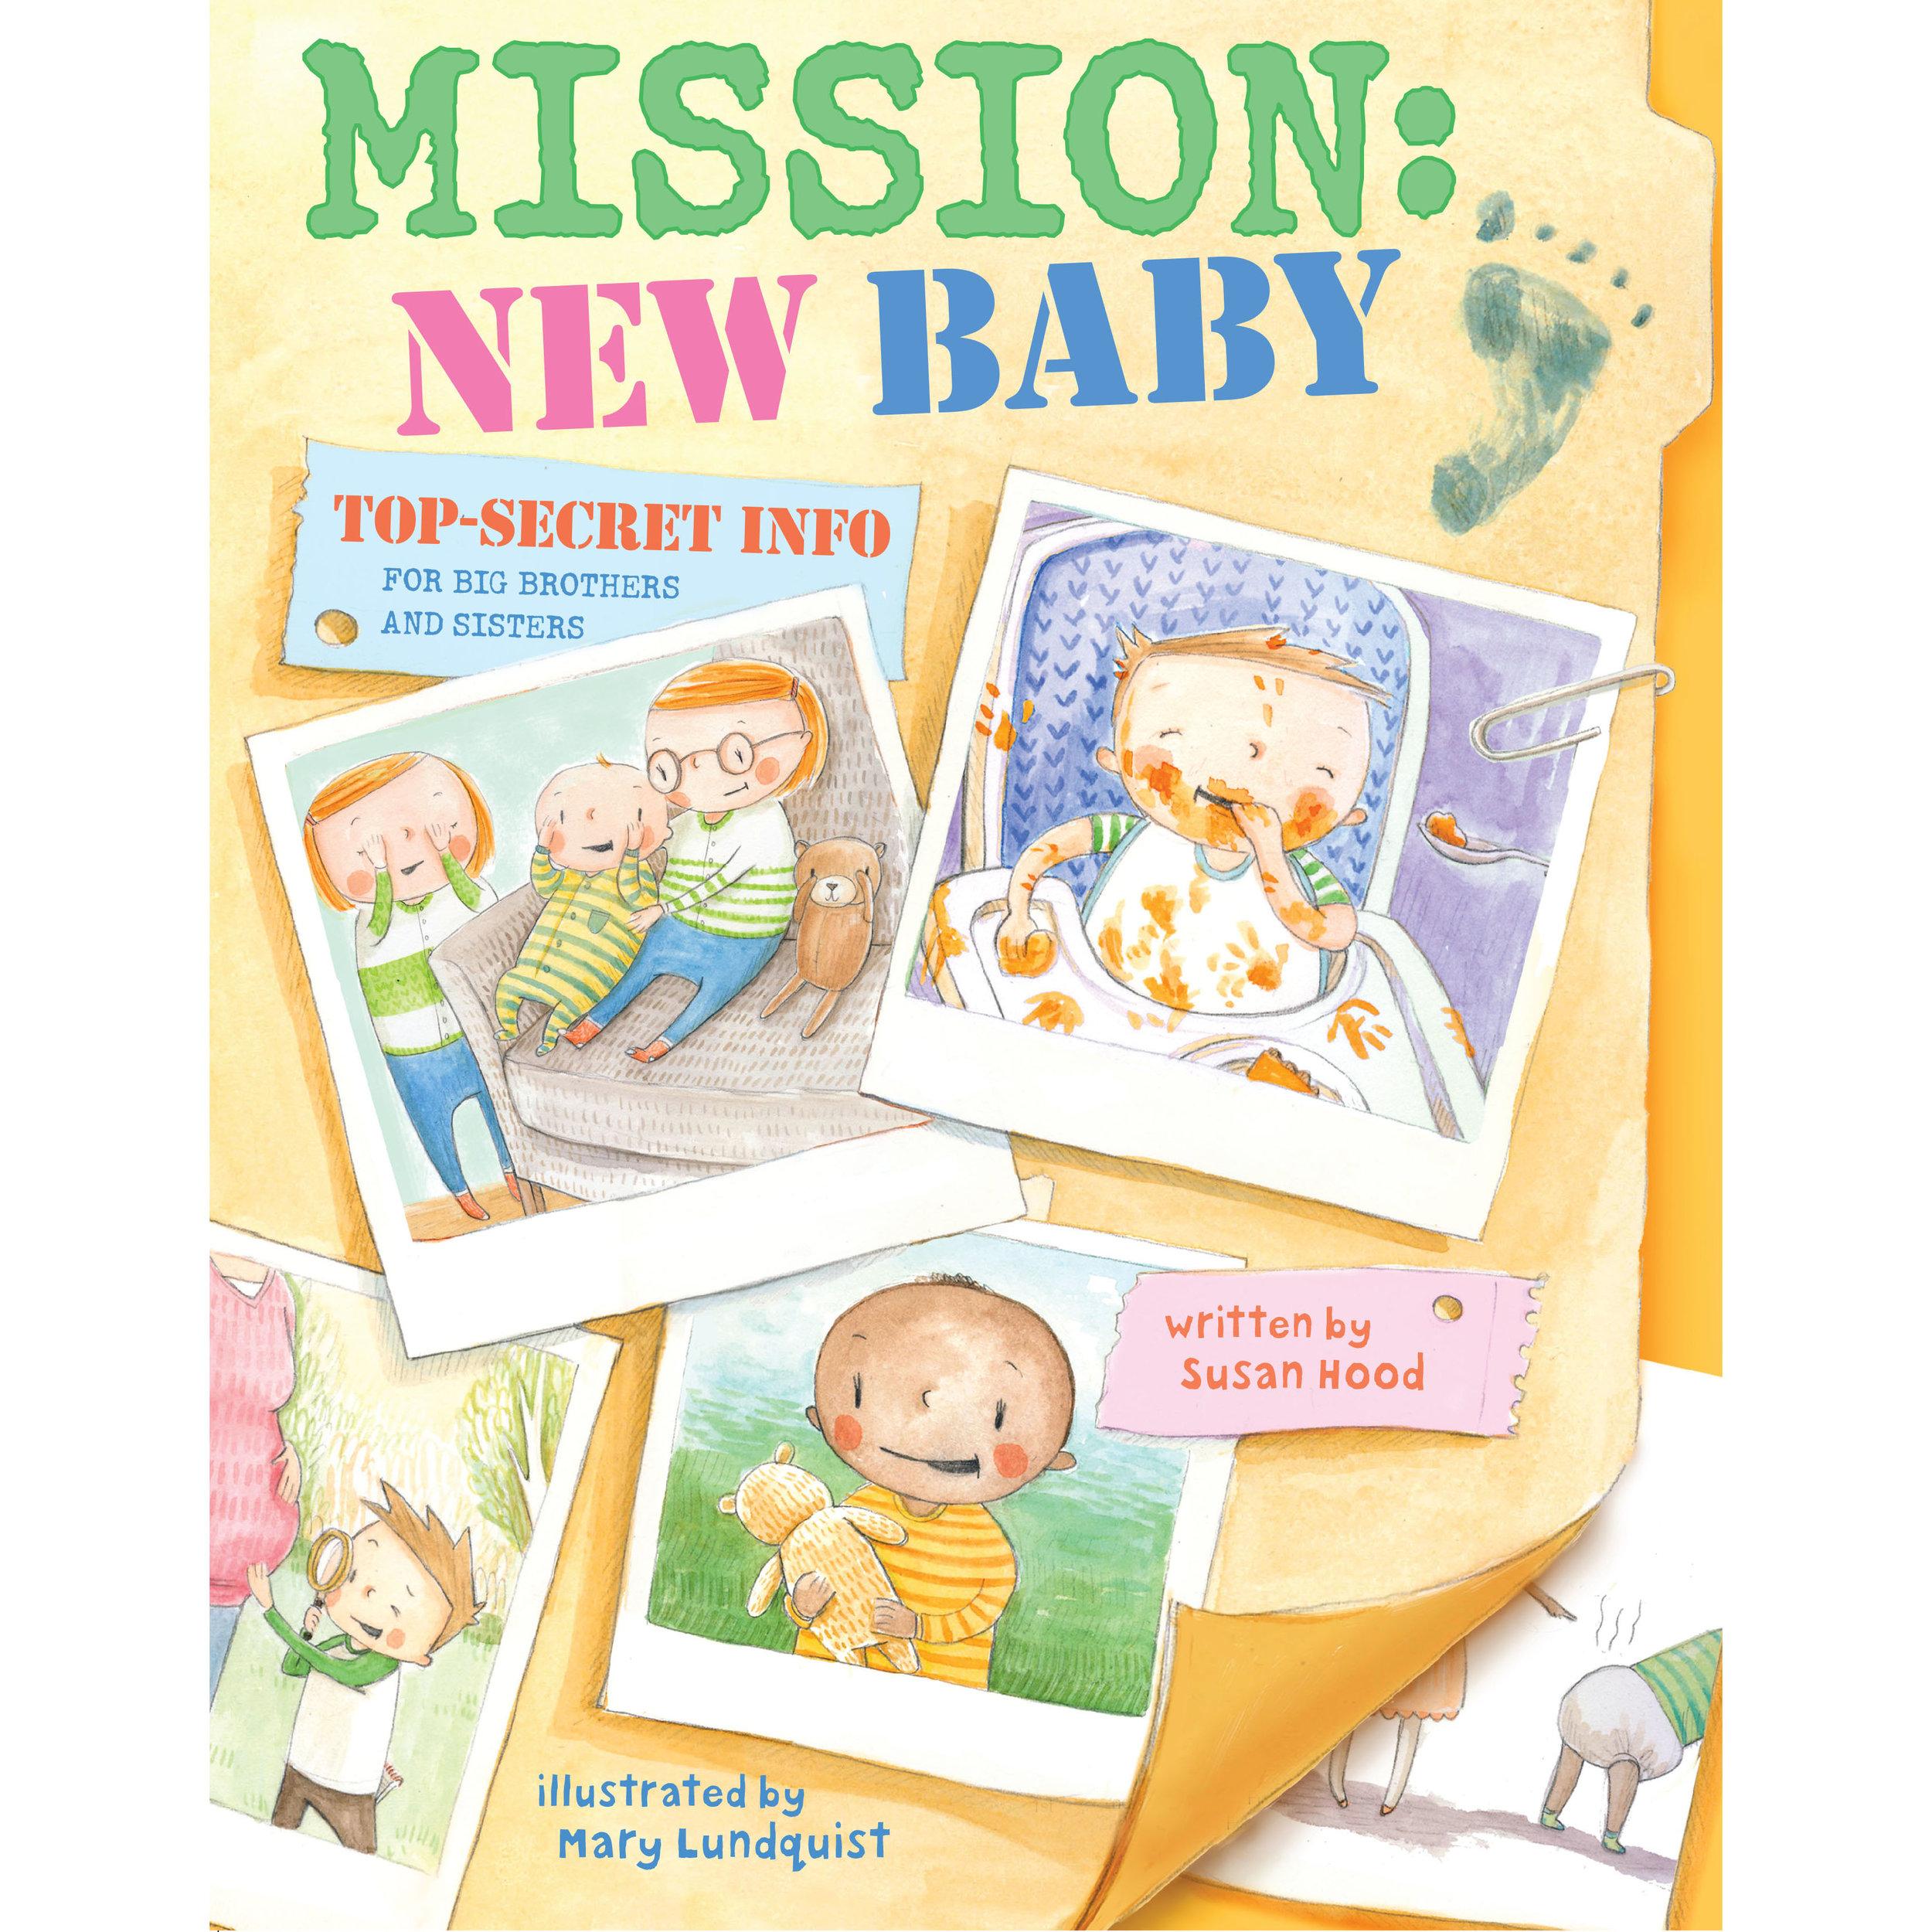 MissionNB_cover1.jpg